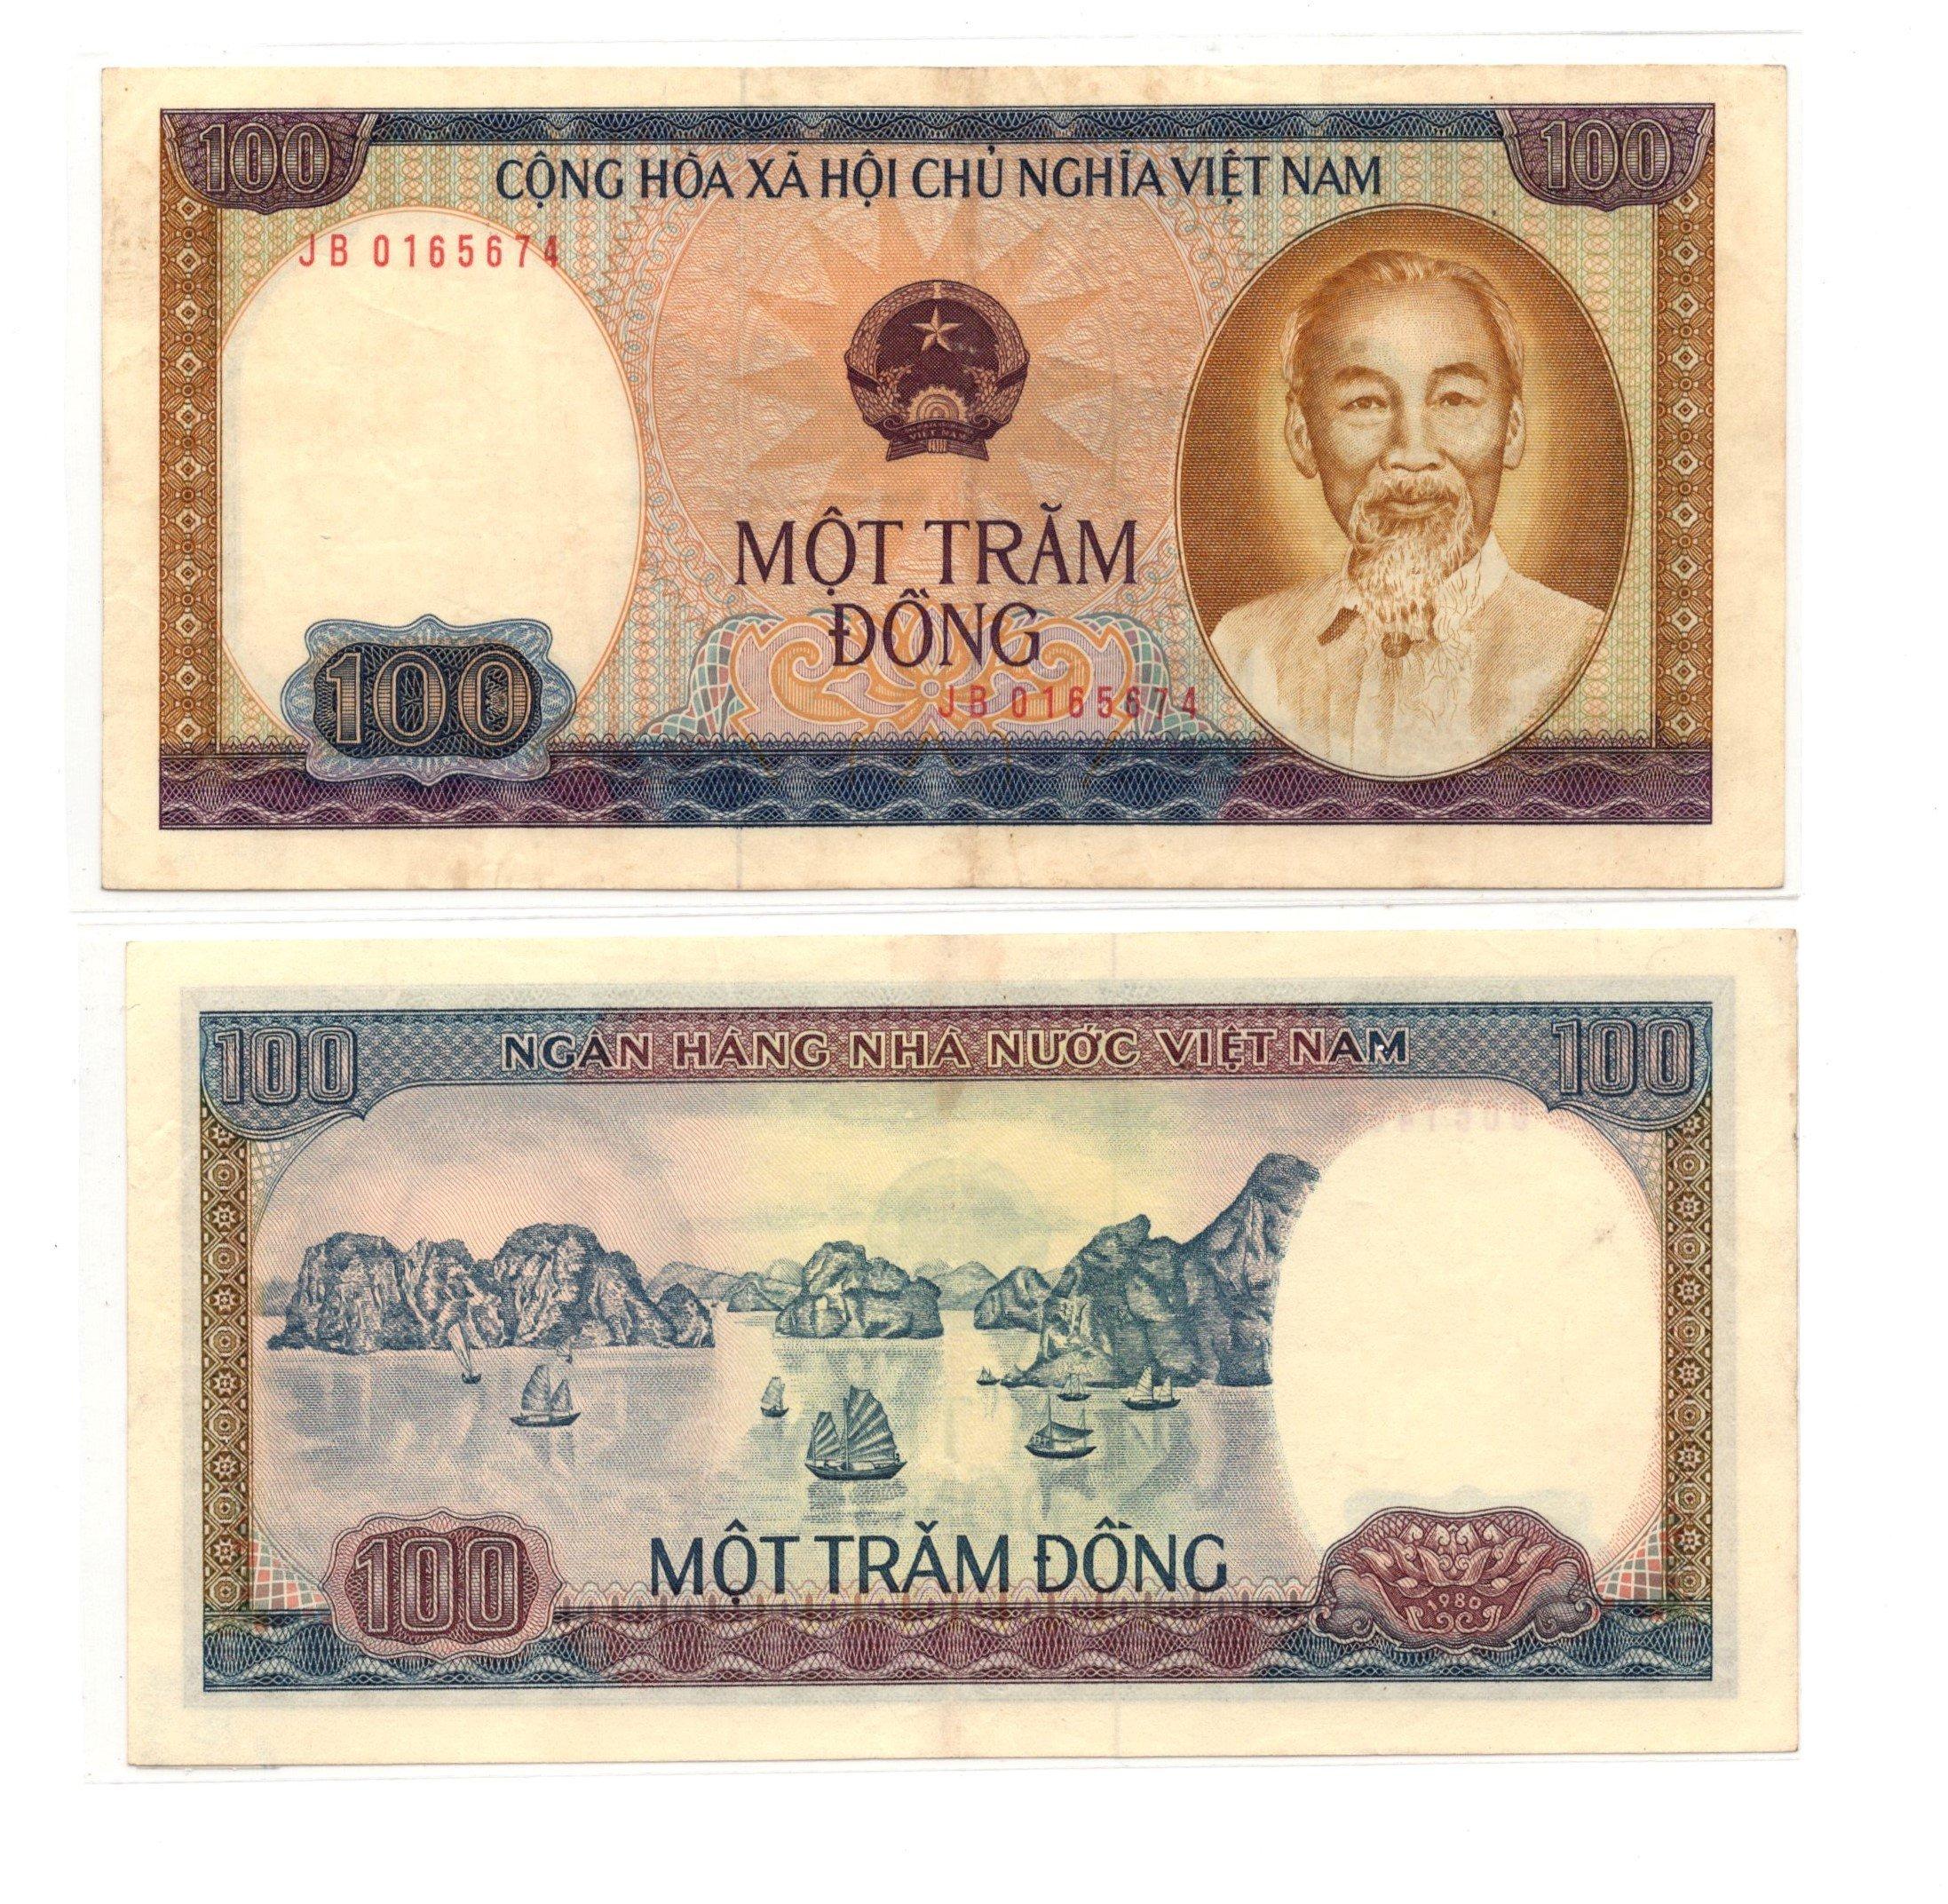 vietnam 100 dong 1980 banknote